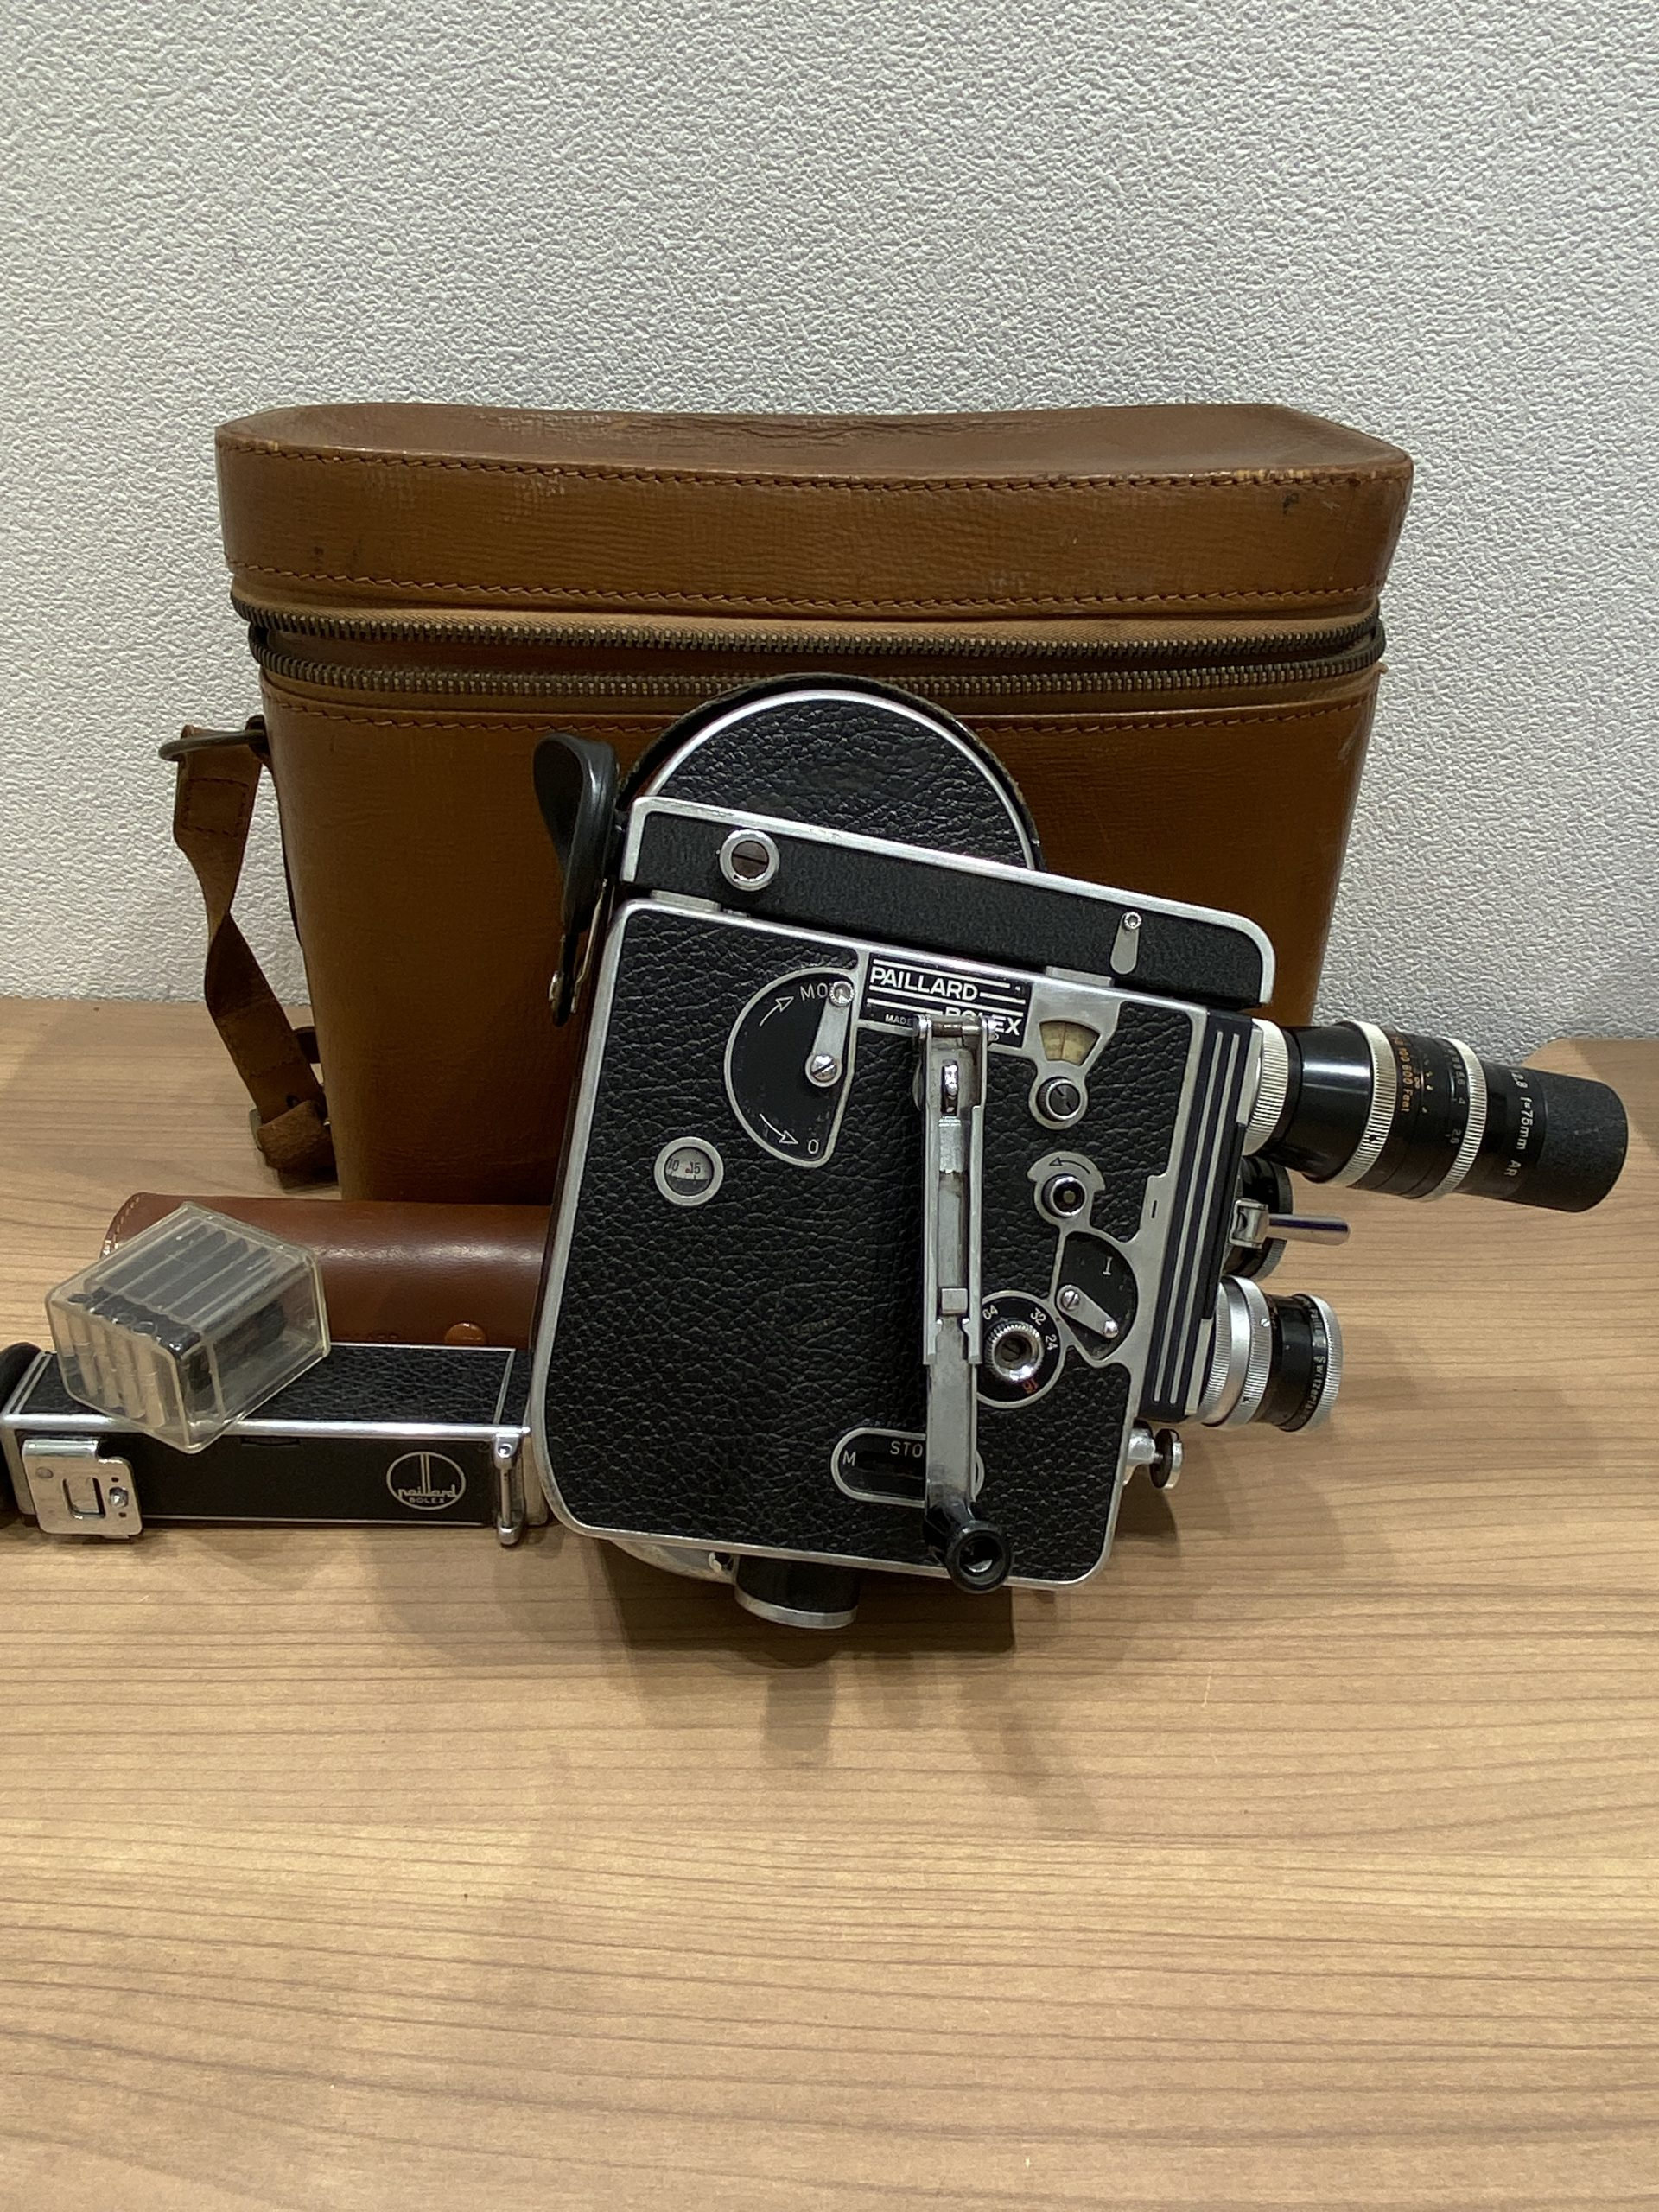 【BOLEX PAILLARD/ボレックスパイヤール】H16 REFLEX/16mm フィルムカメラ アンティーク